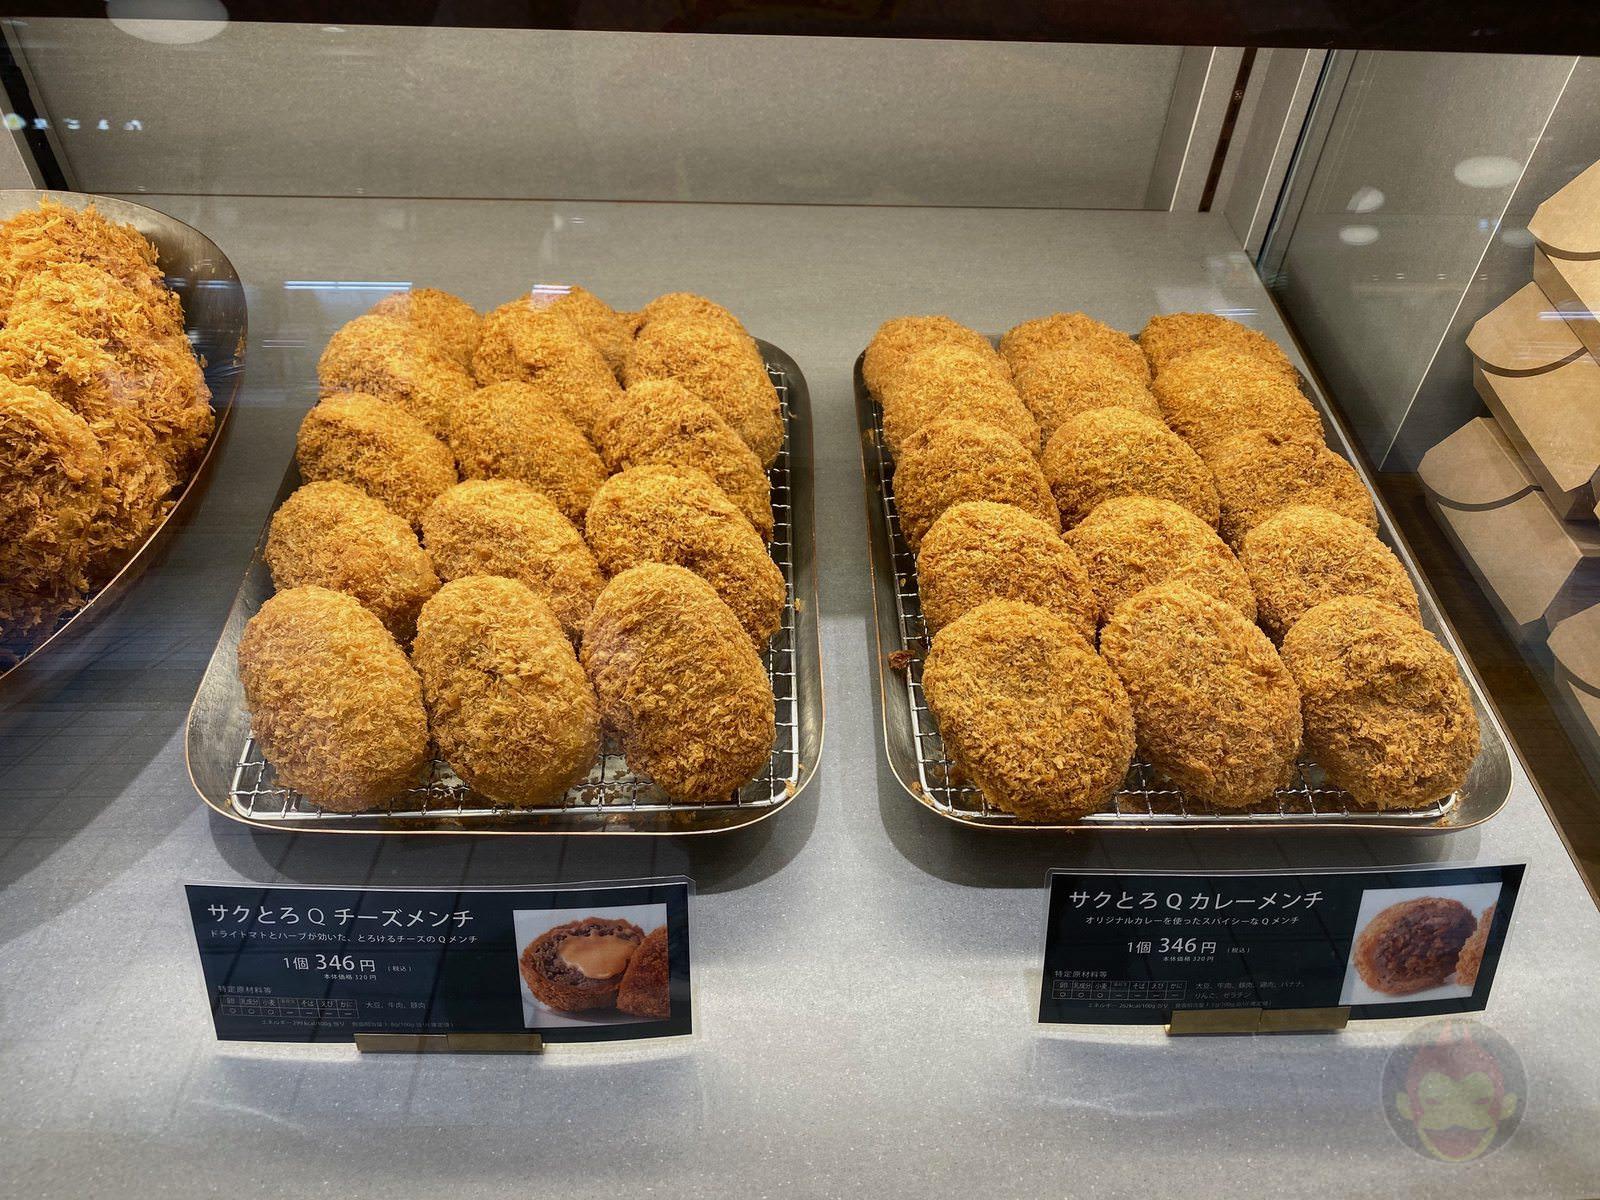 Shibuya-Scramble-Square-Food-I-Ate-118.jpeg